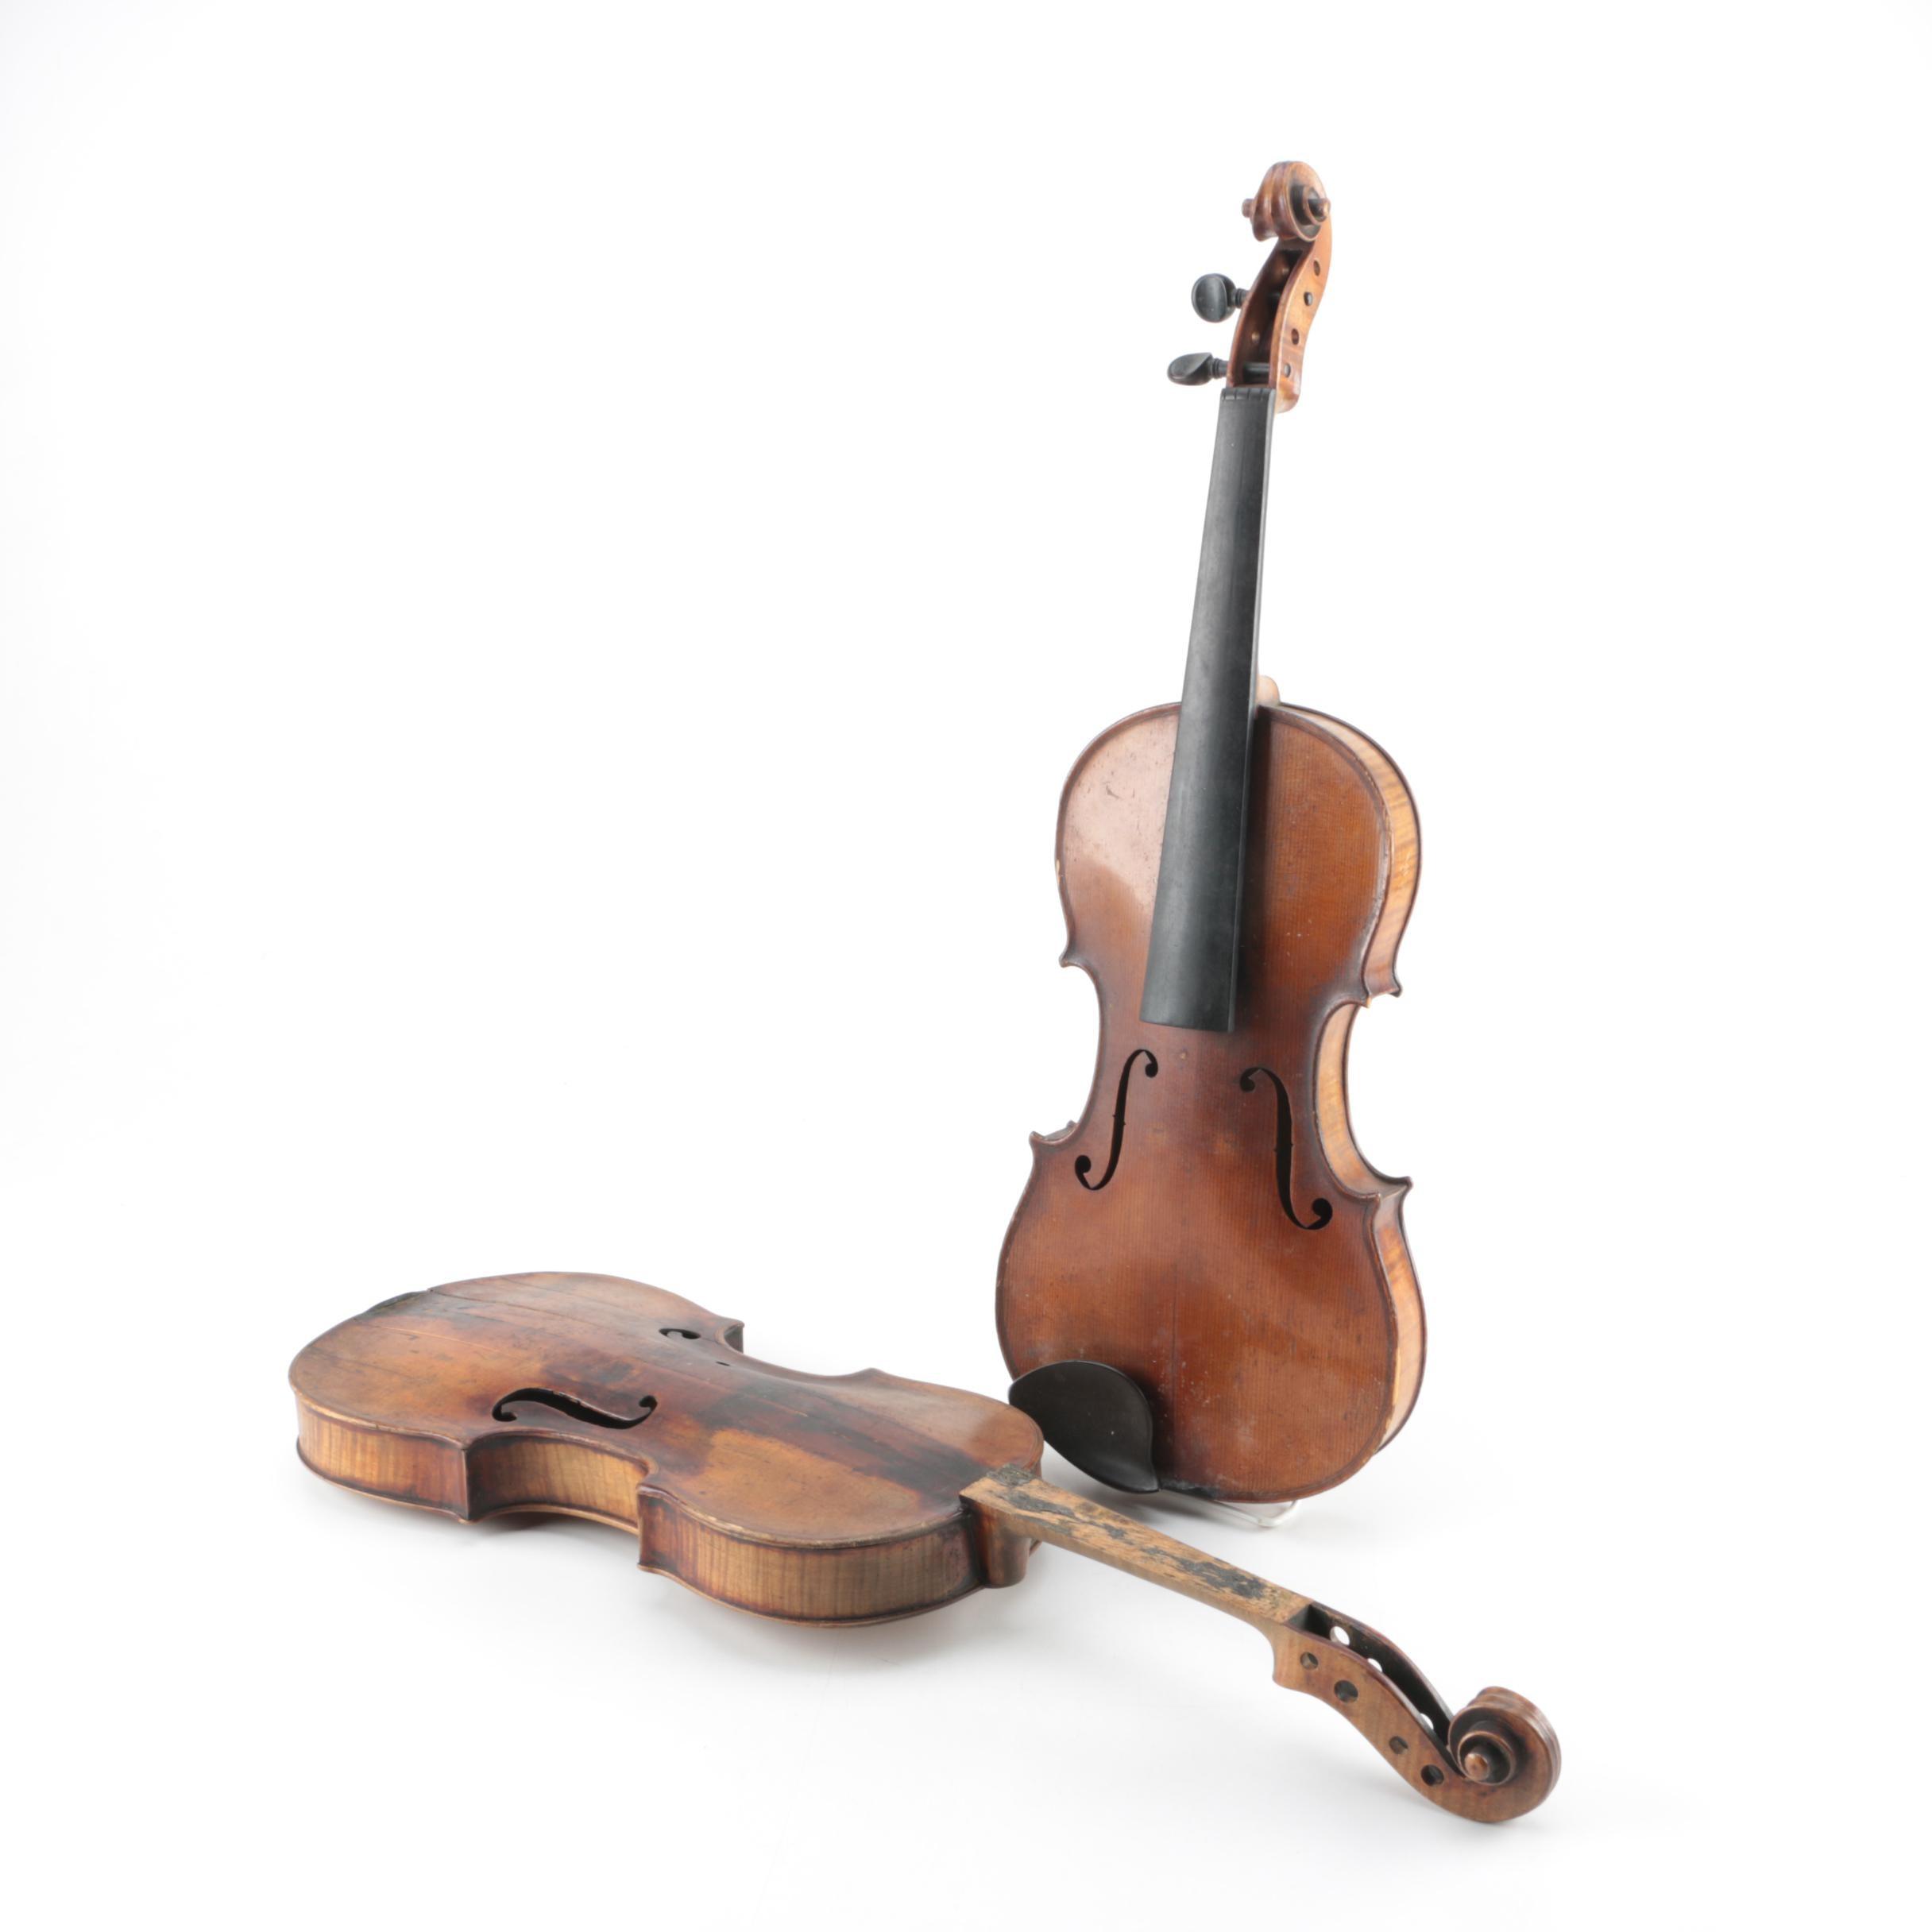 Vintage Violin Bodies Including Stradivarius Reproduction